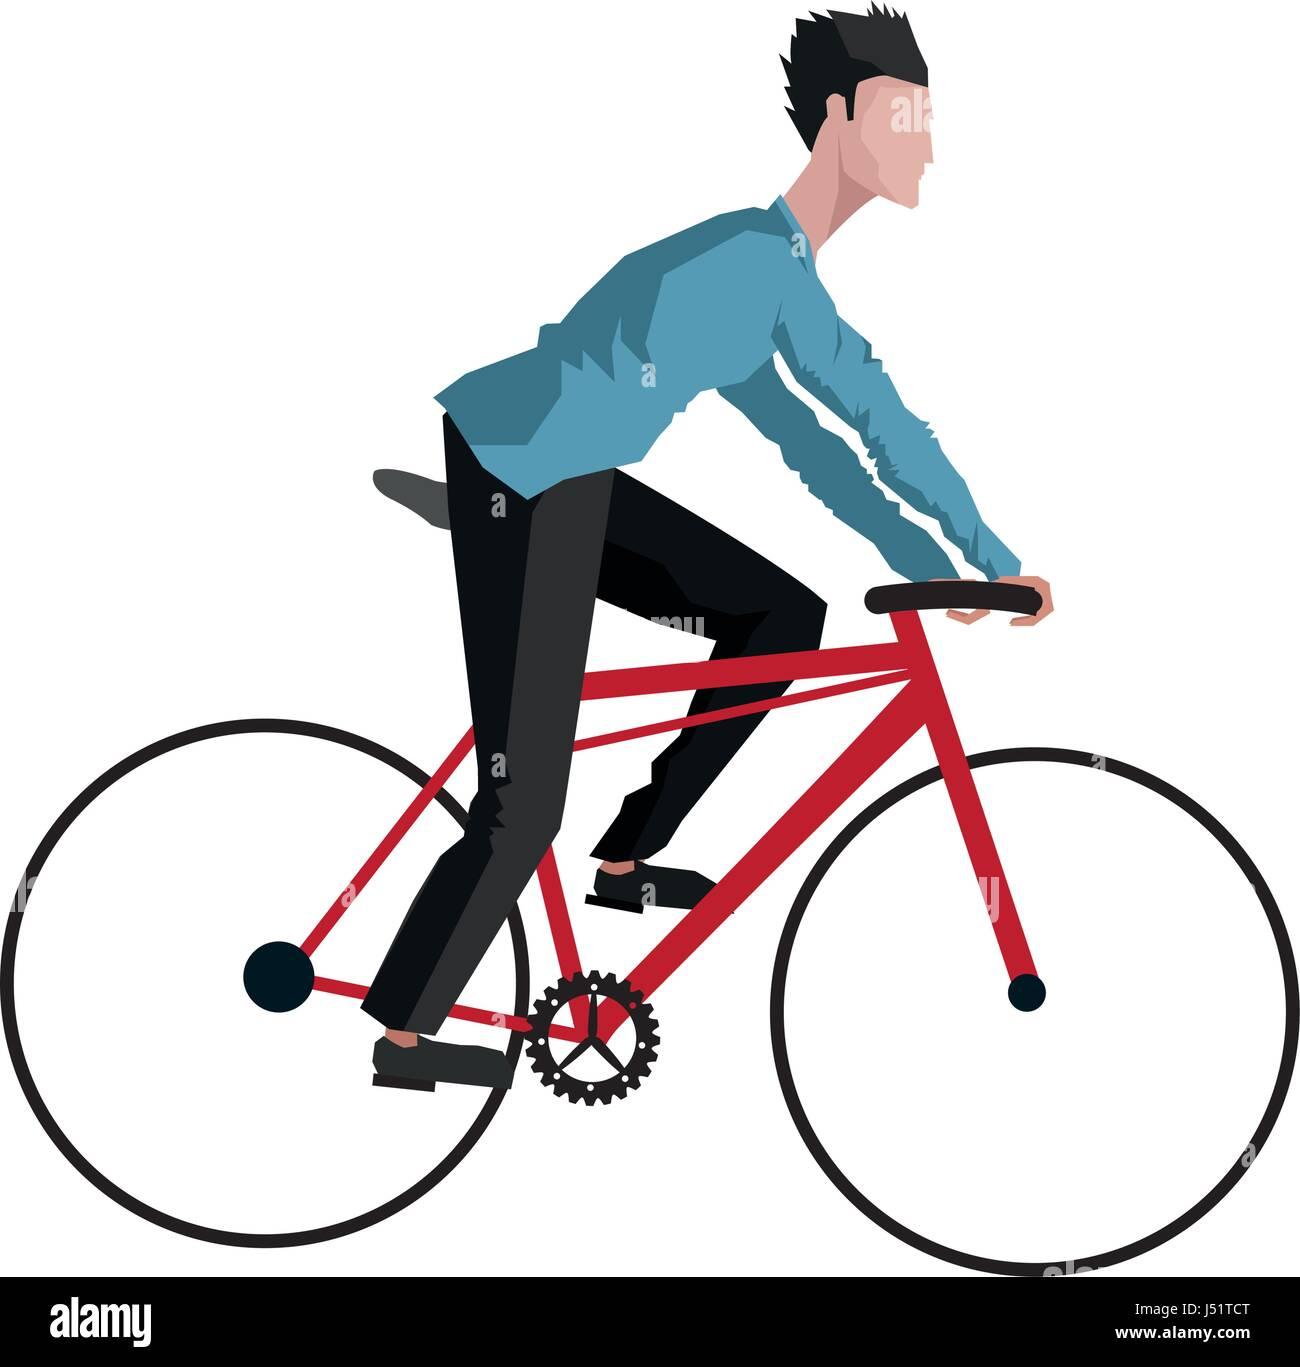 guy rider bike transport - Stock Image